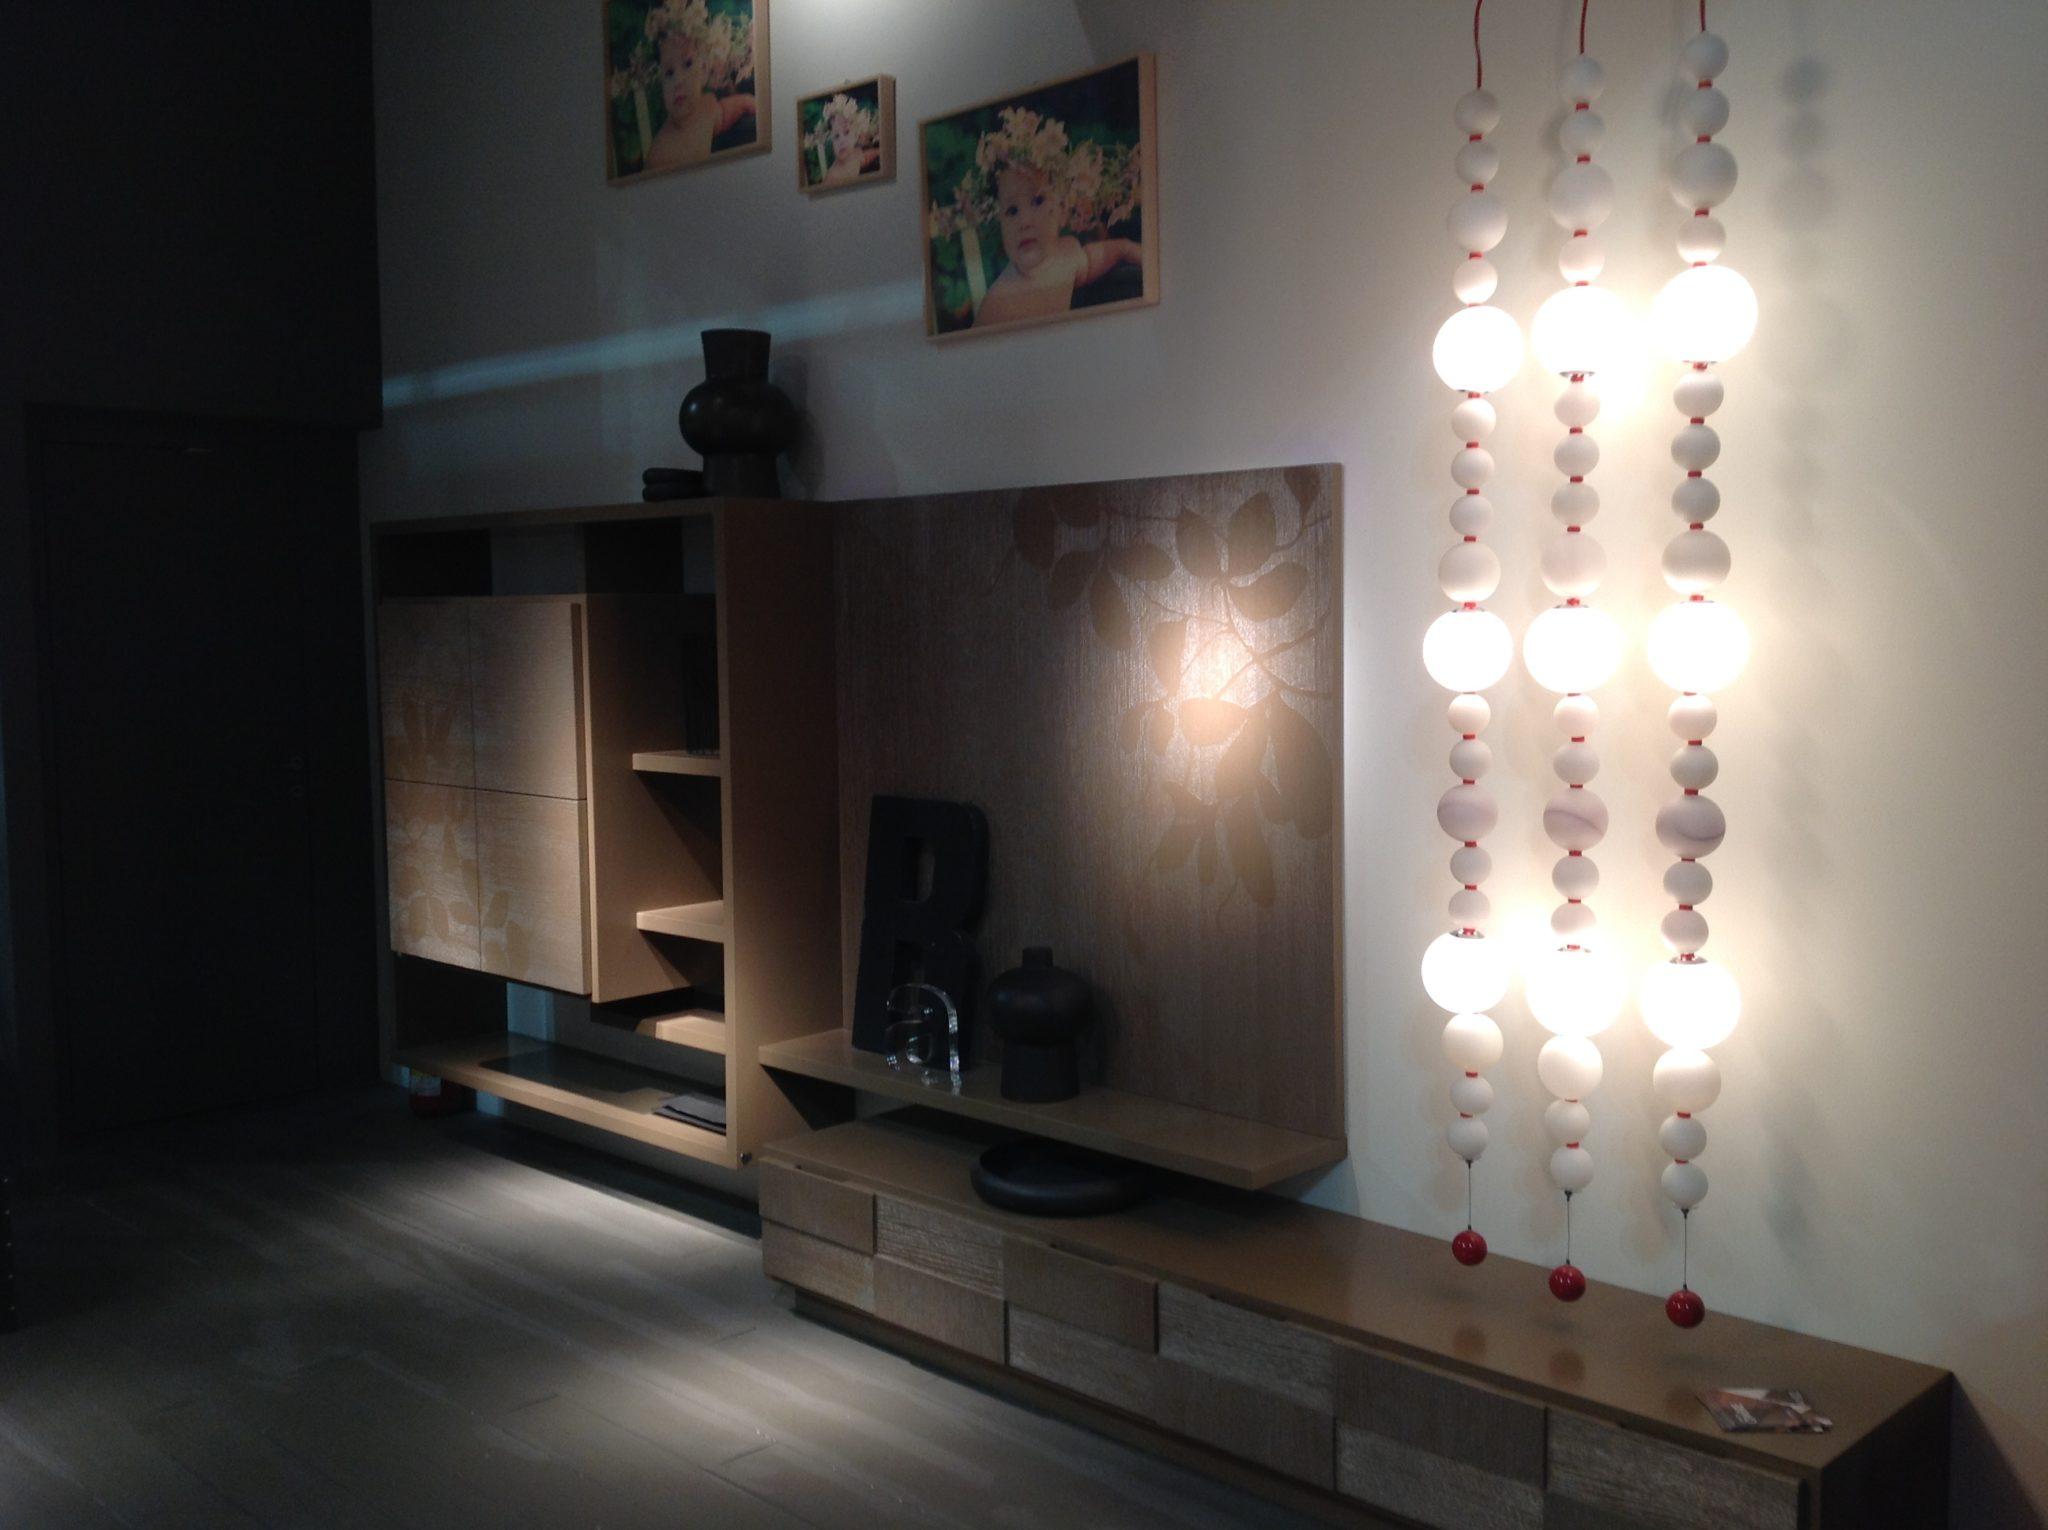 21 iSaloni 2014 milan design week interior design fair design de luxe luksosowe meble targi w mediolanie Marchetti